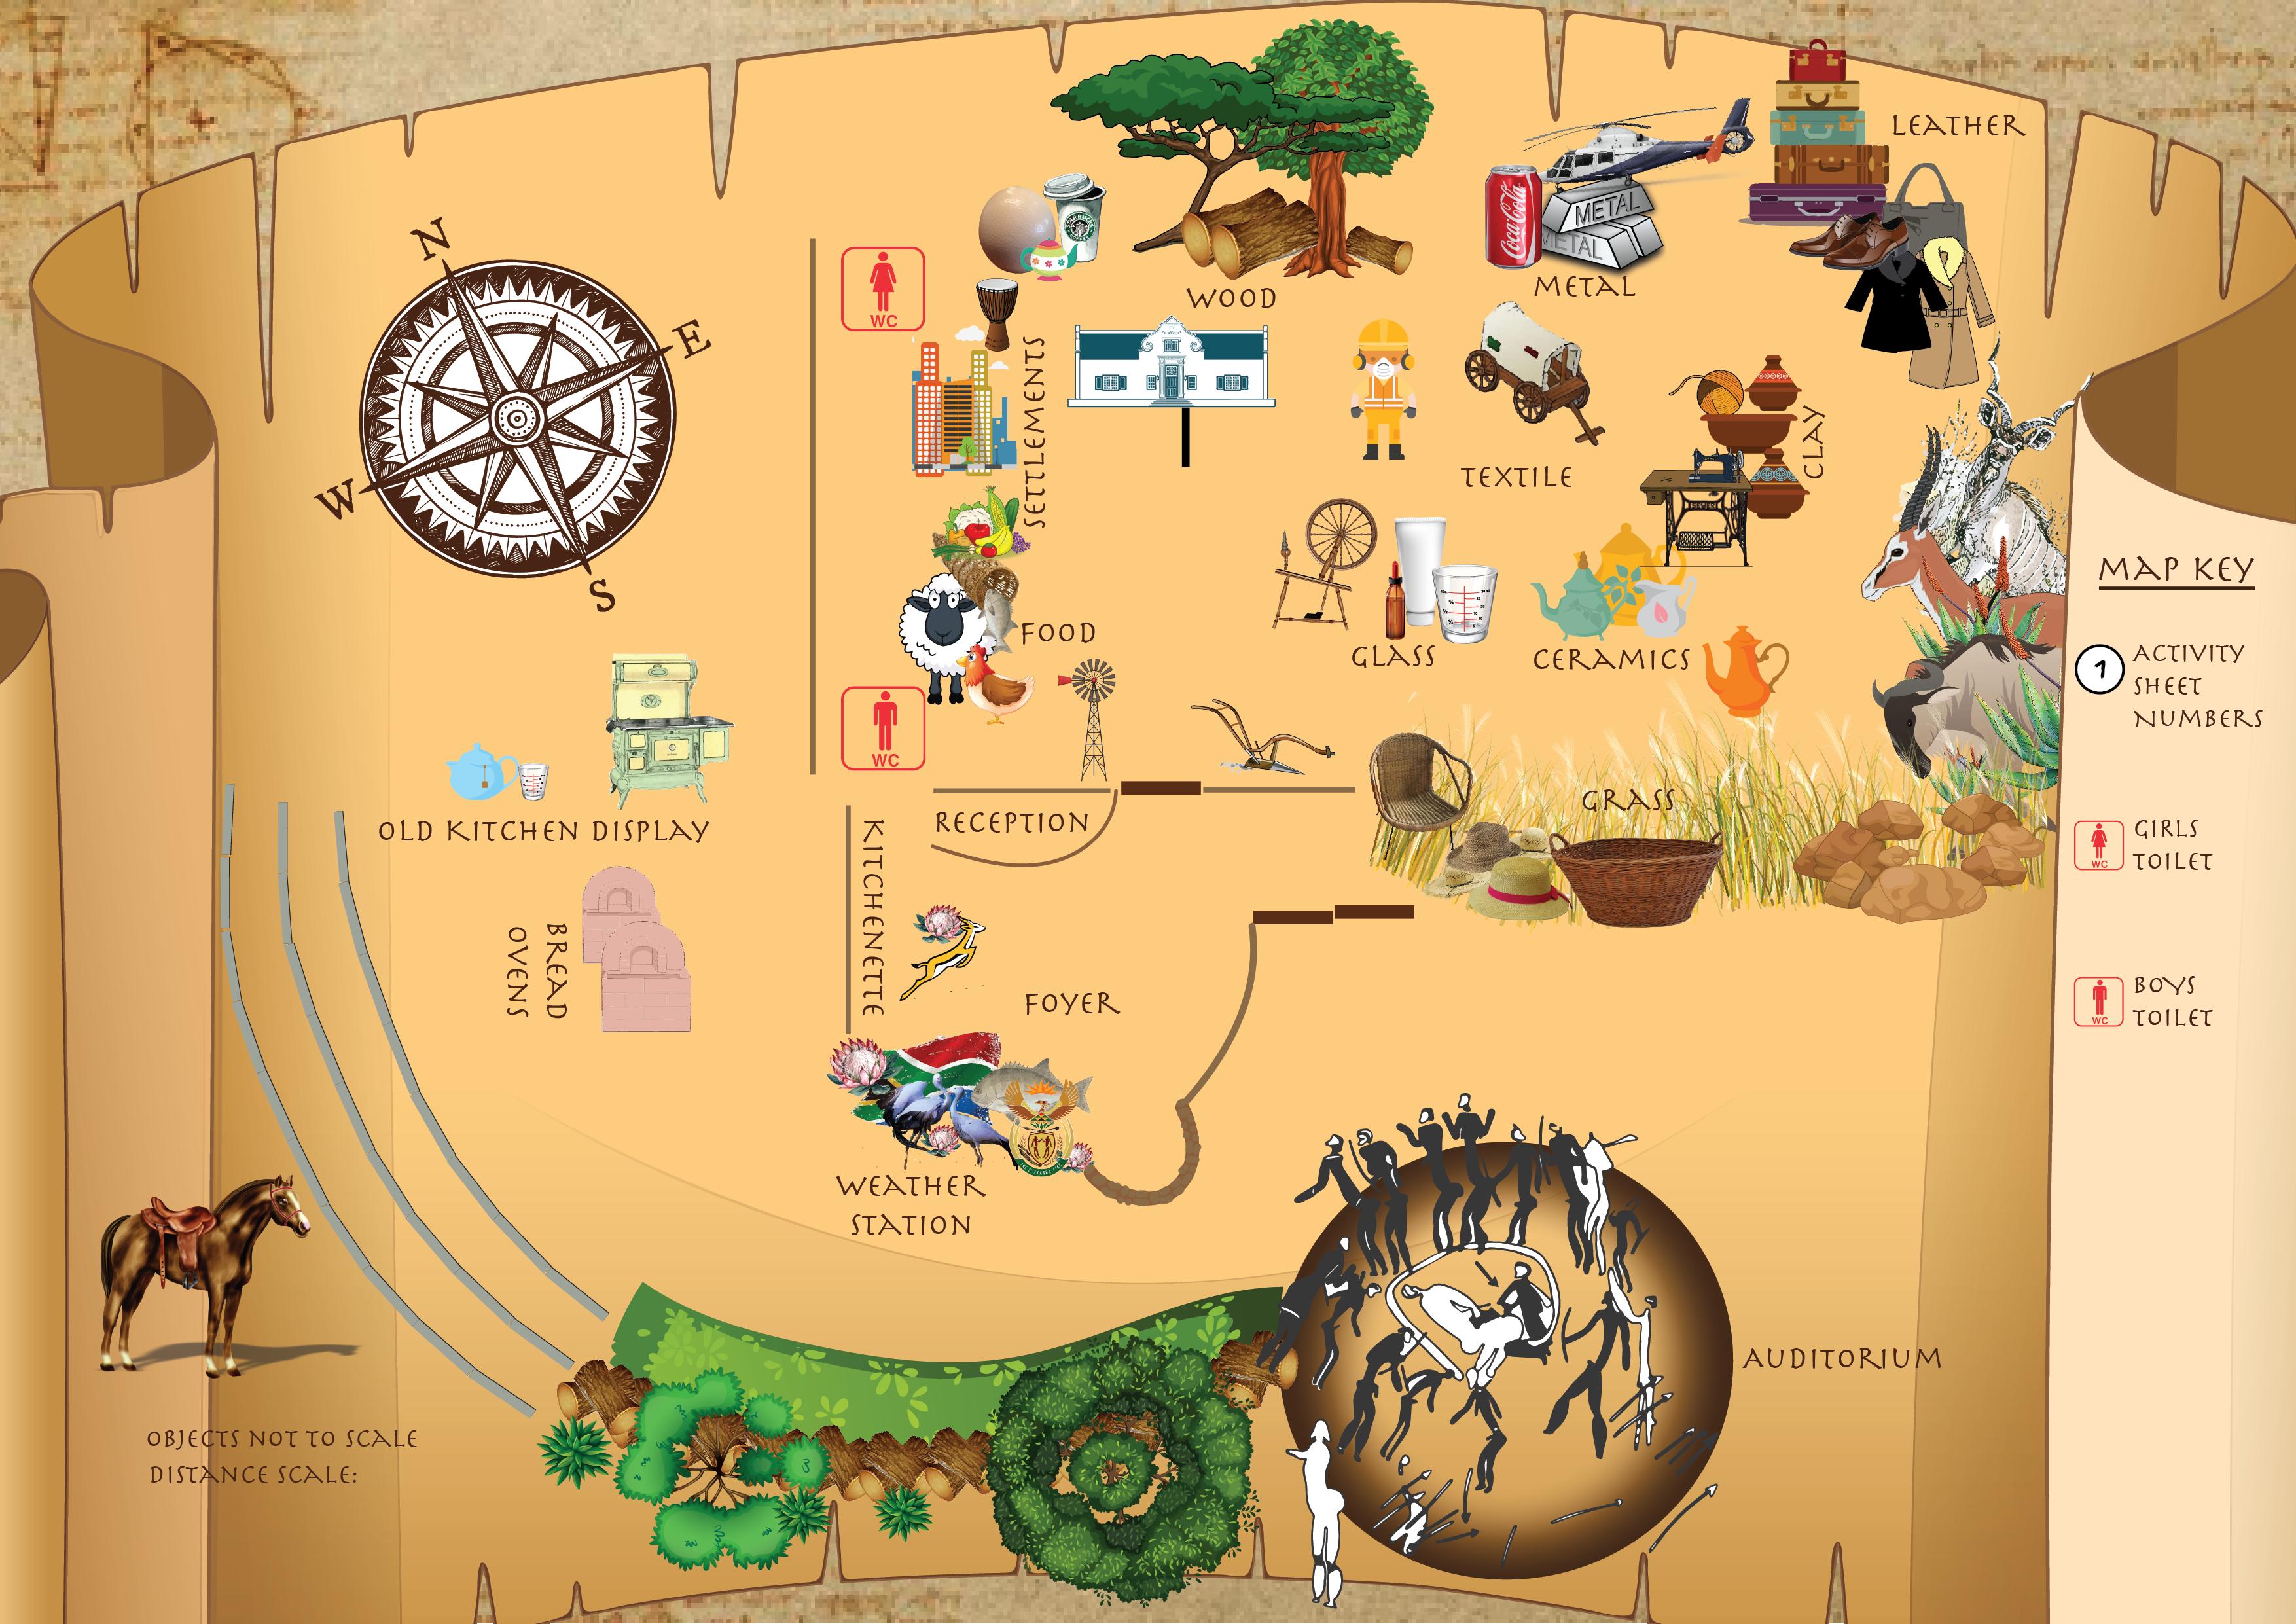 FUNDA DISCOVERY CENTRE INTERACTIVE MAP